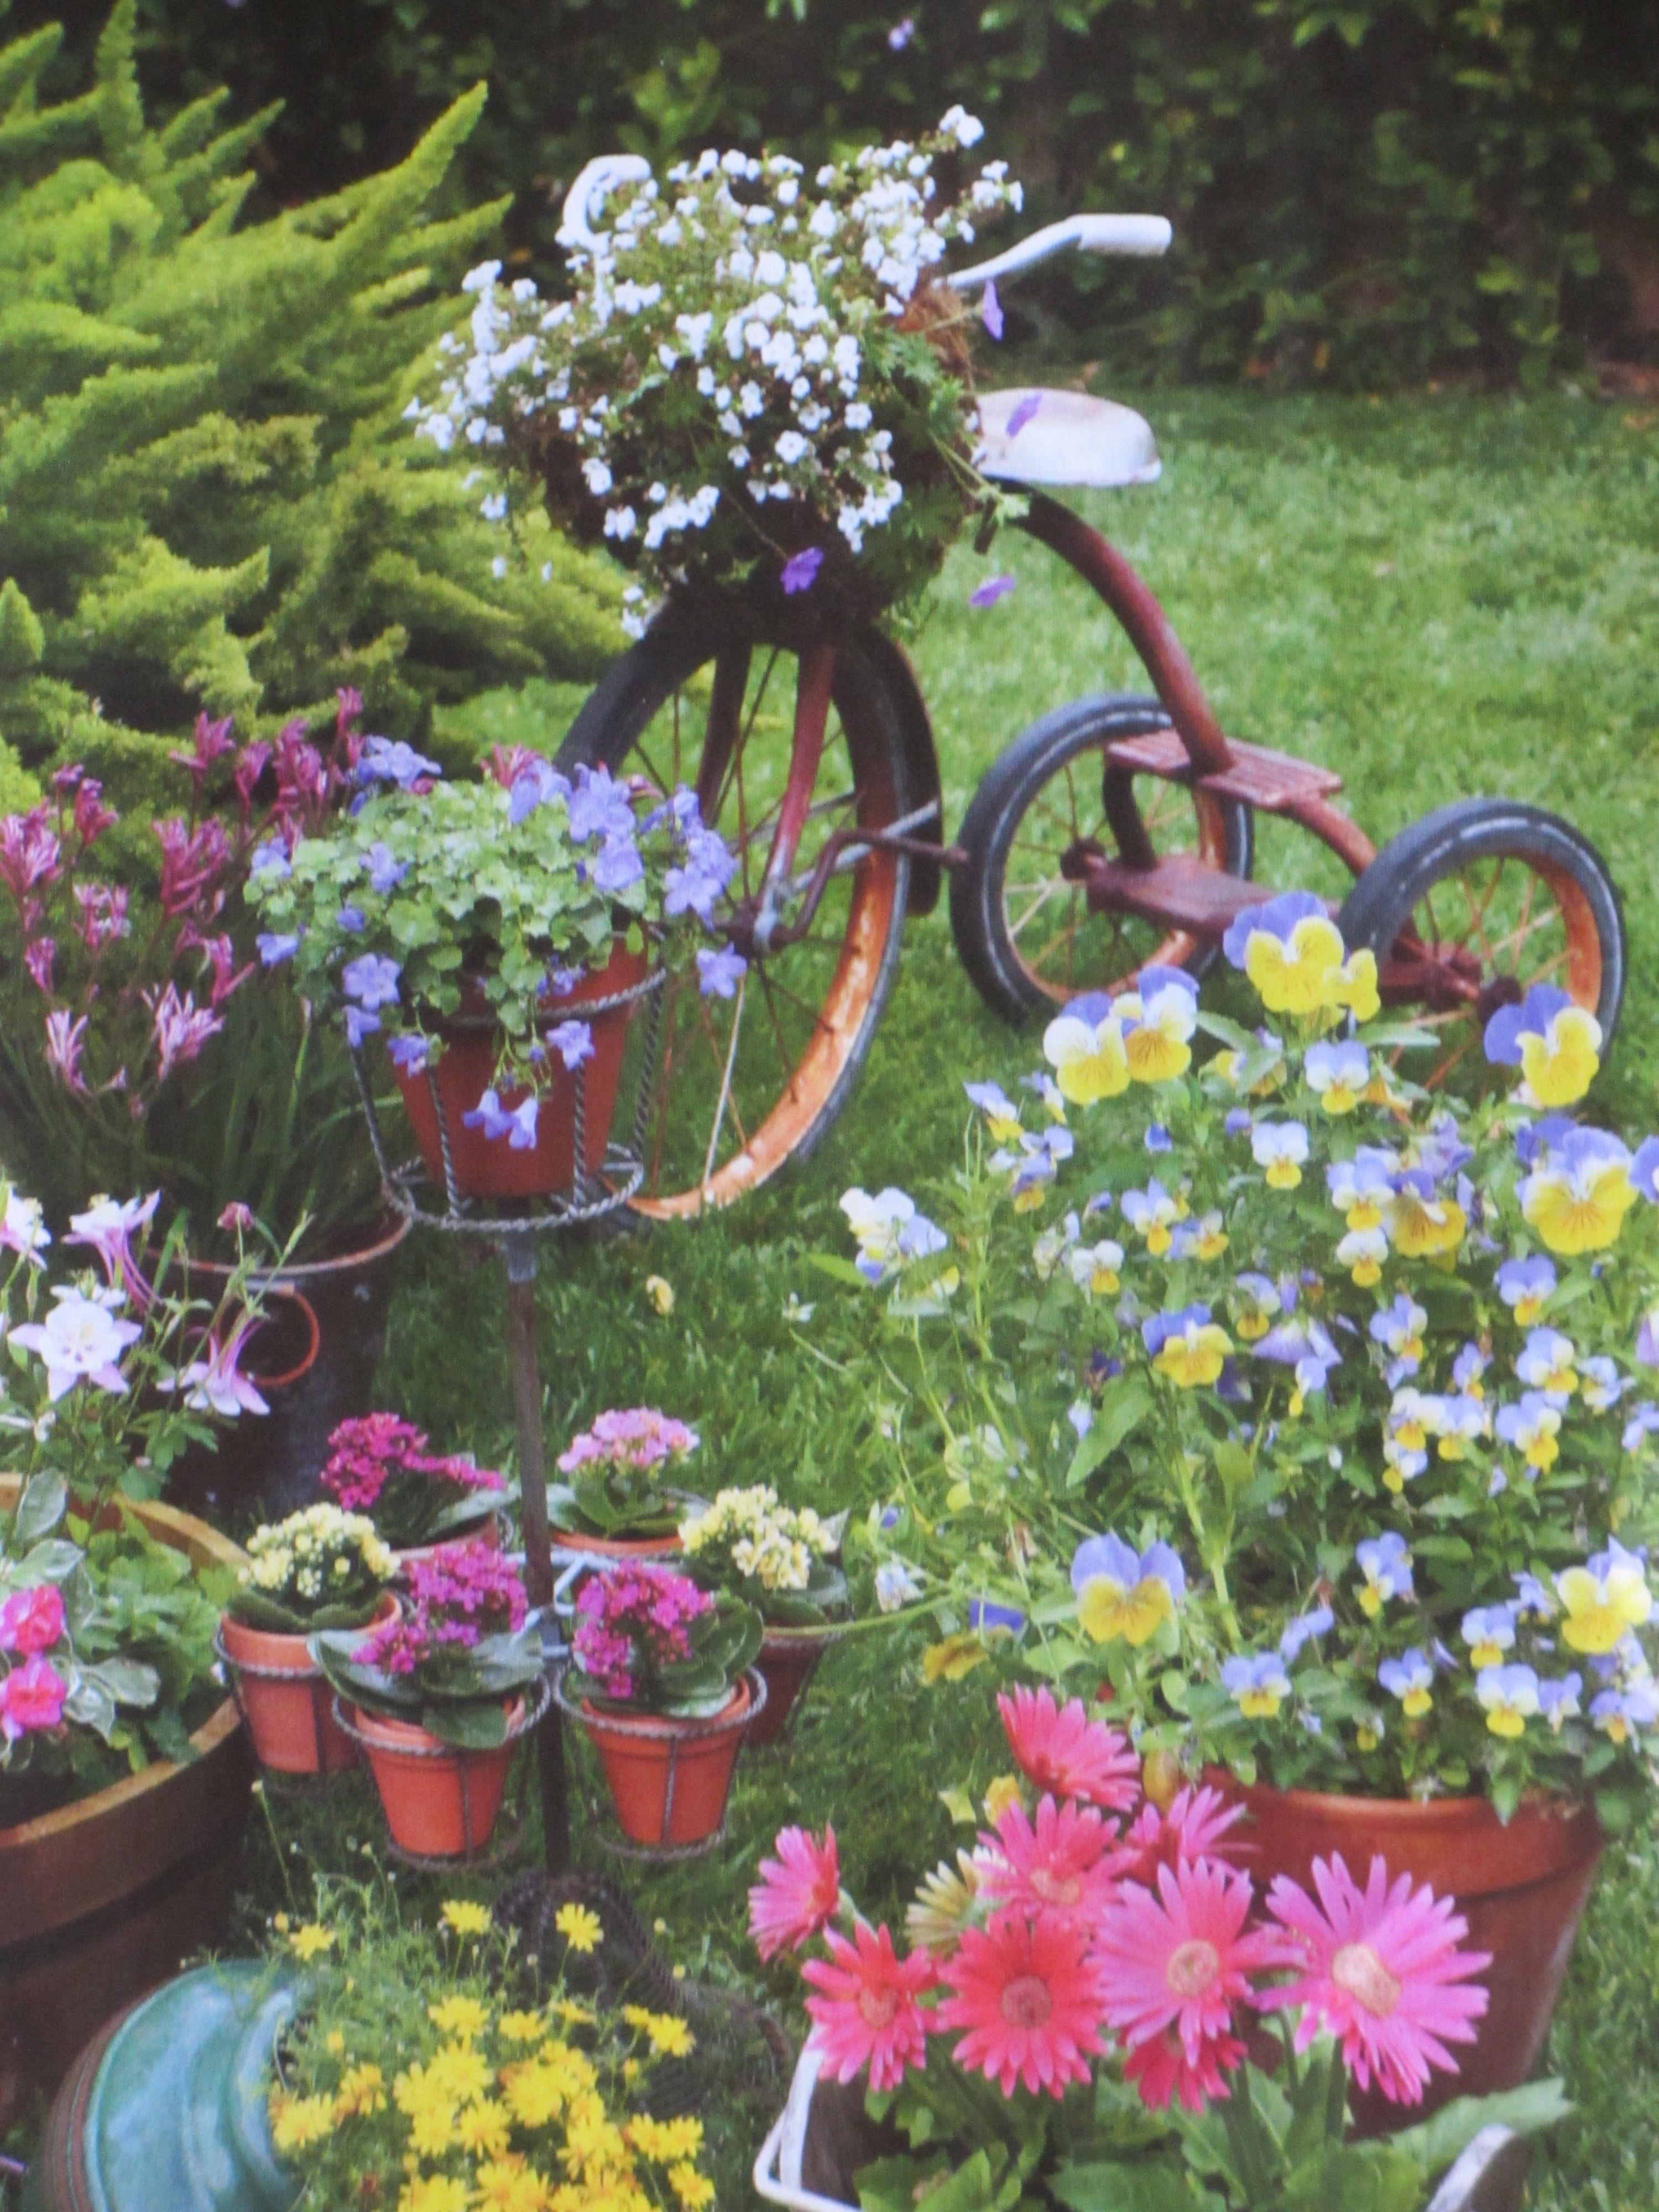 cute garden idea - the old tricycle | Cute garden ideas ... on Cute Small Backyard Ideas id=96576